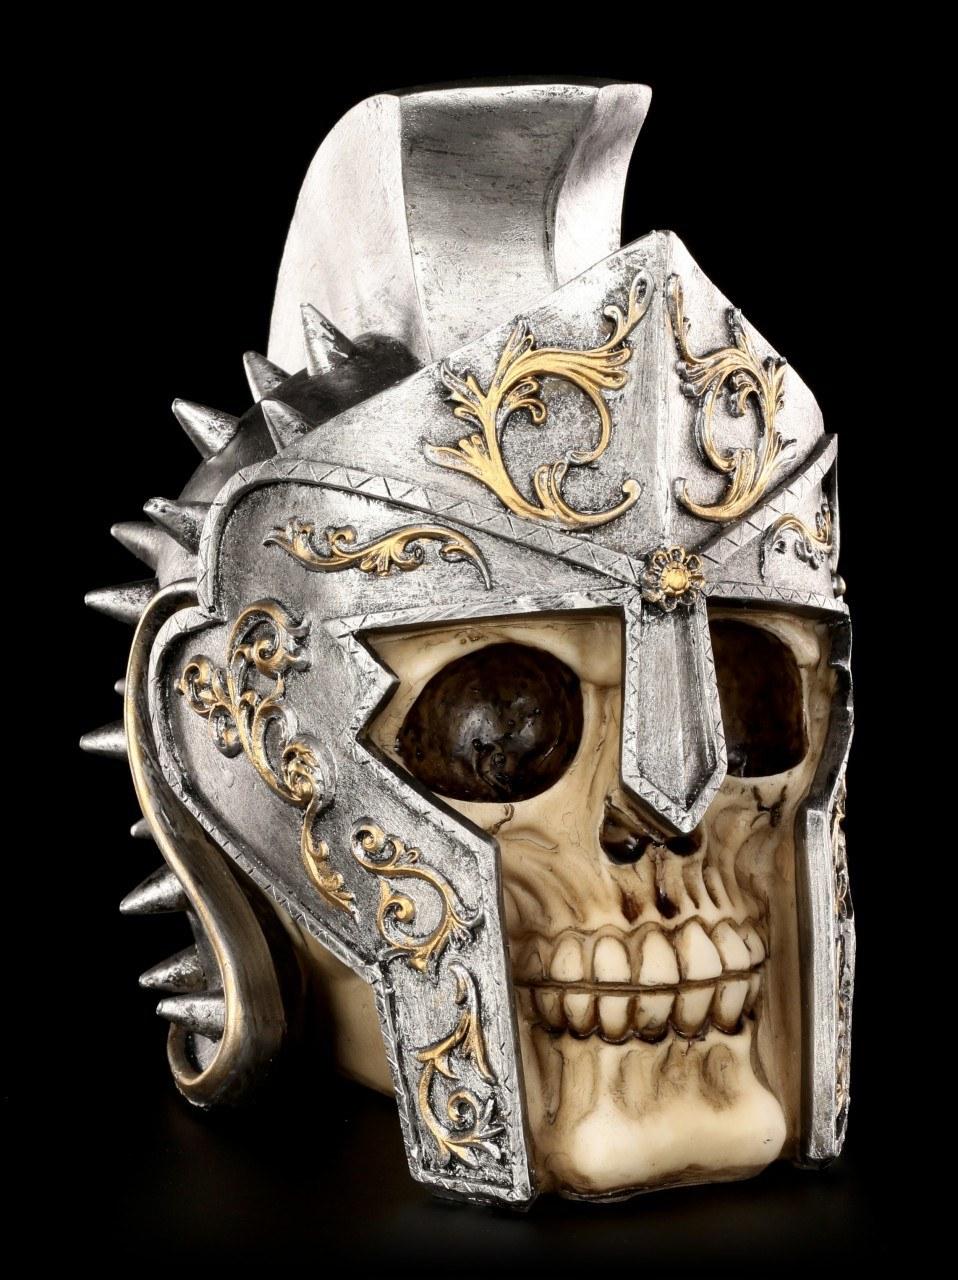 Skull with Roman Gladiator Helmet